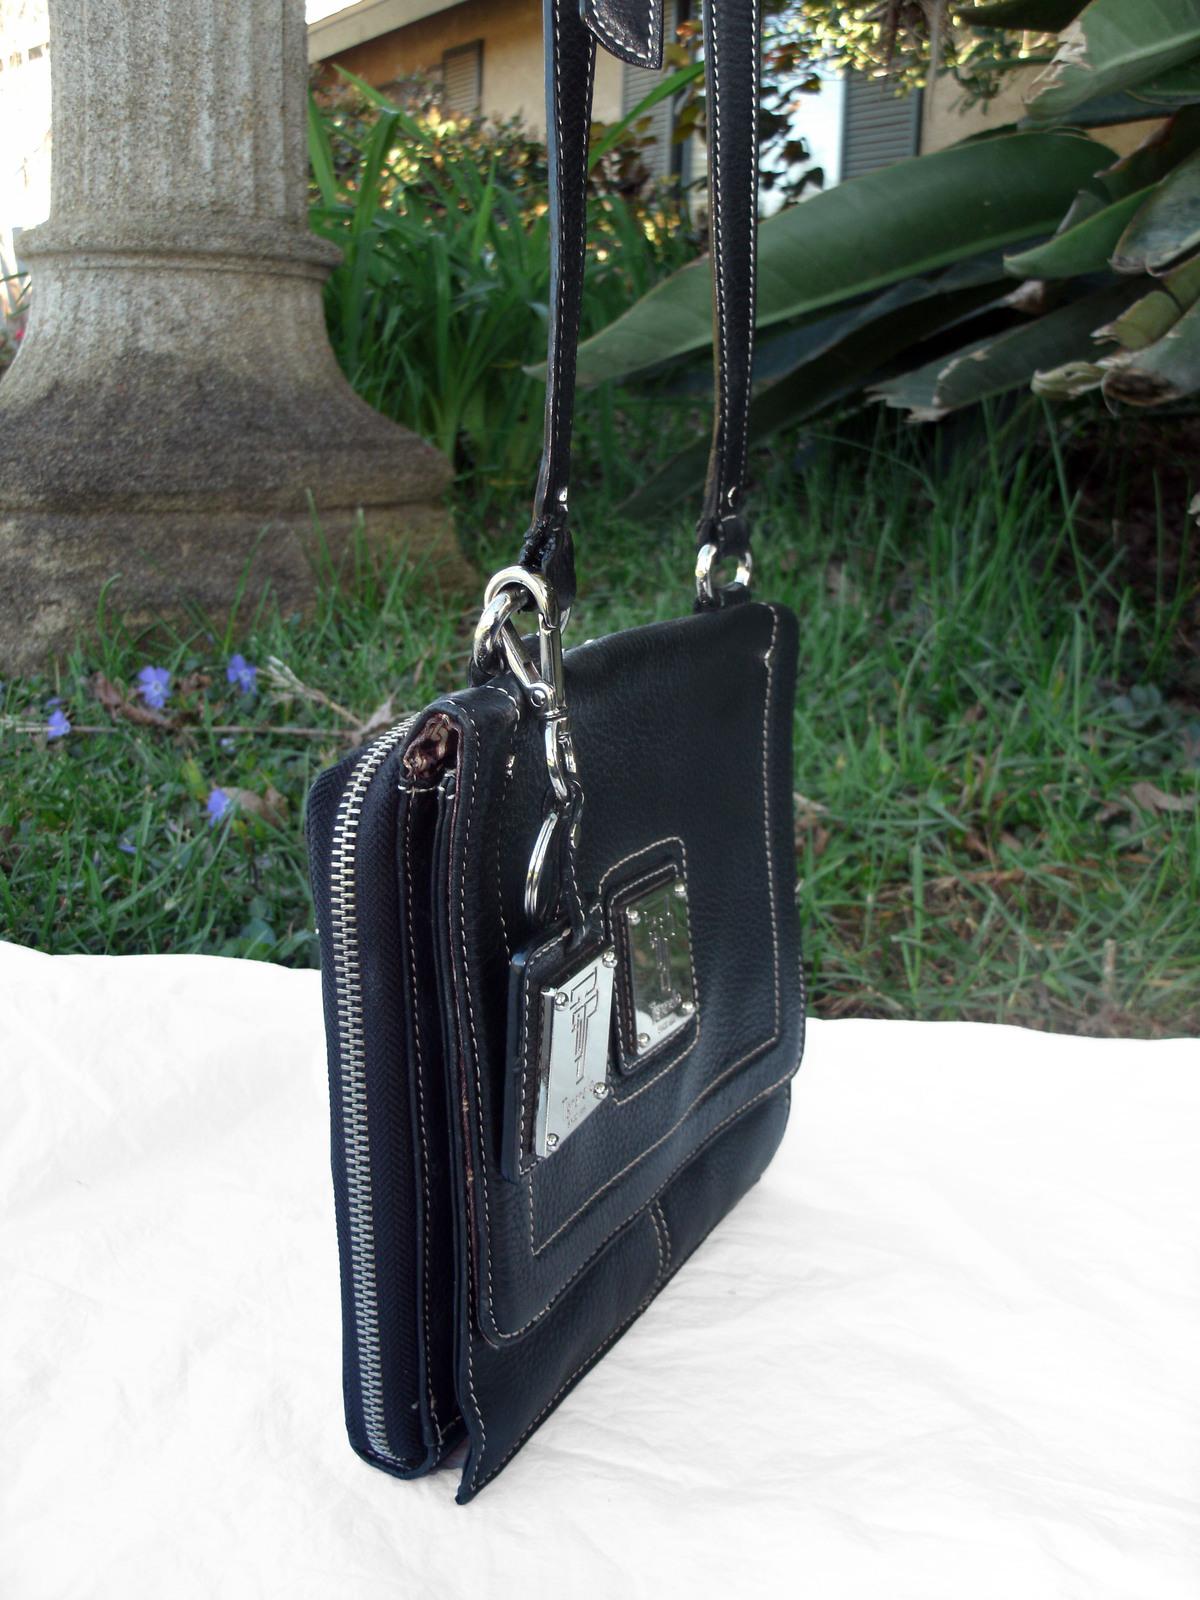 Tignanello Black Pebbled Leather Organizer Crossbody built in Wallet image 3